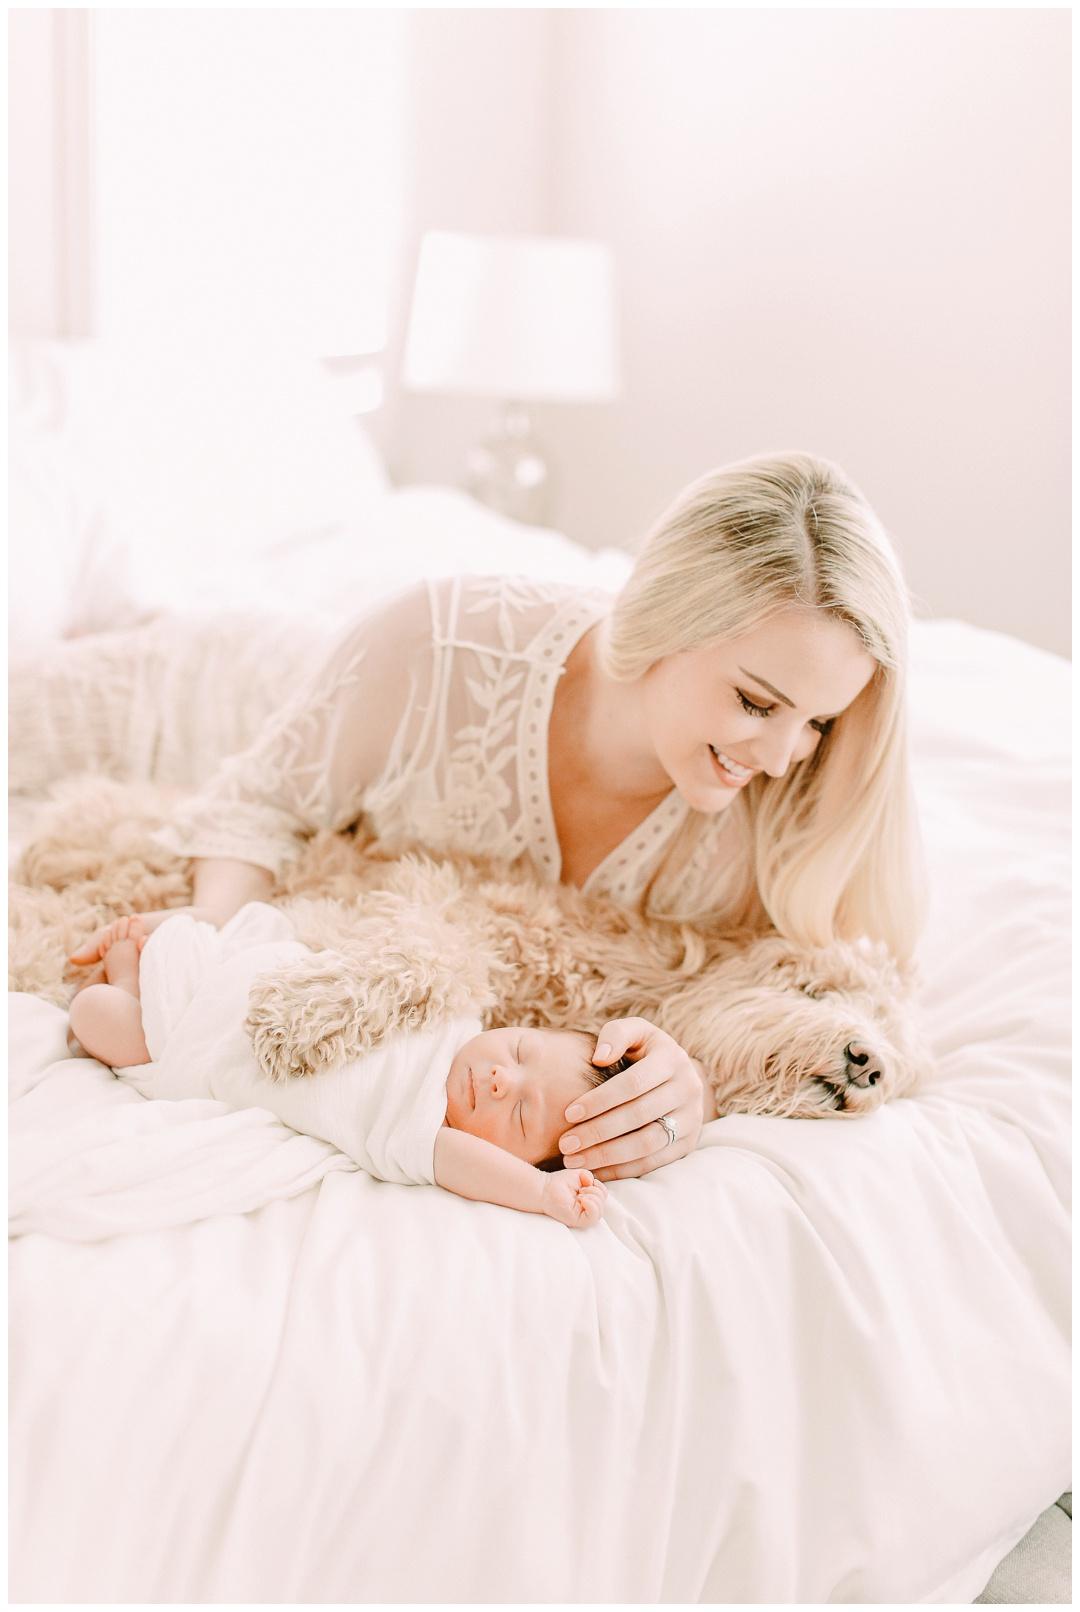 Newport_Beach_Newborn_Photographer_Lifestyle_Newborn_Photography_in_home_session_Cori_Kleckner_Photography_0968.jpg